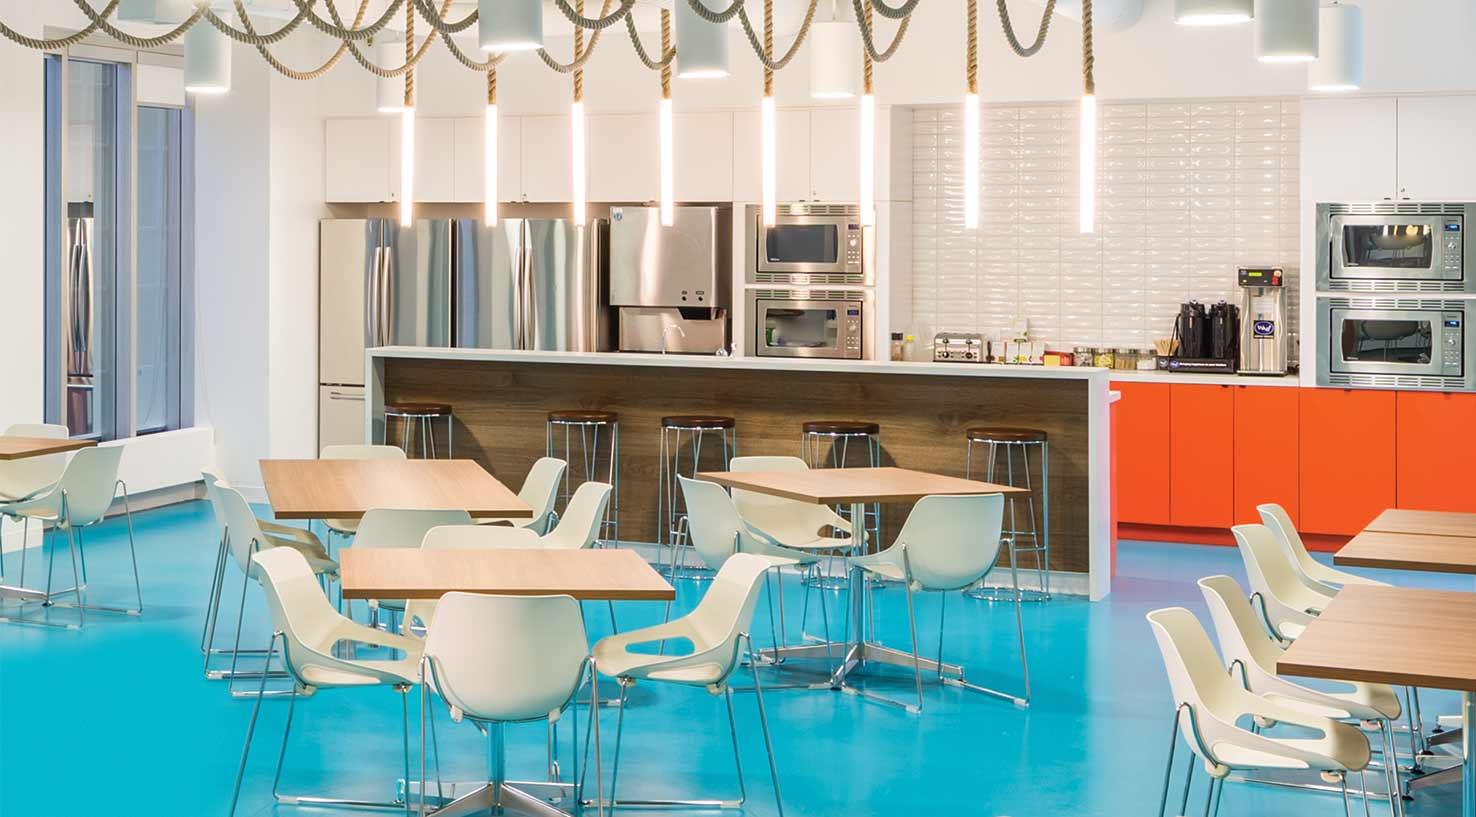 break room at Expedia corporate headquarters in Vancouver